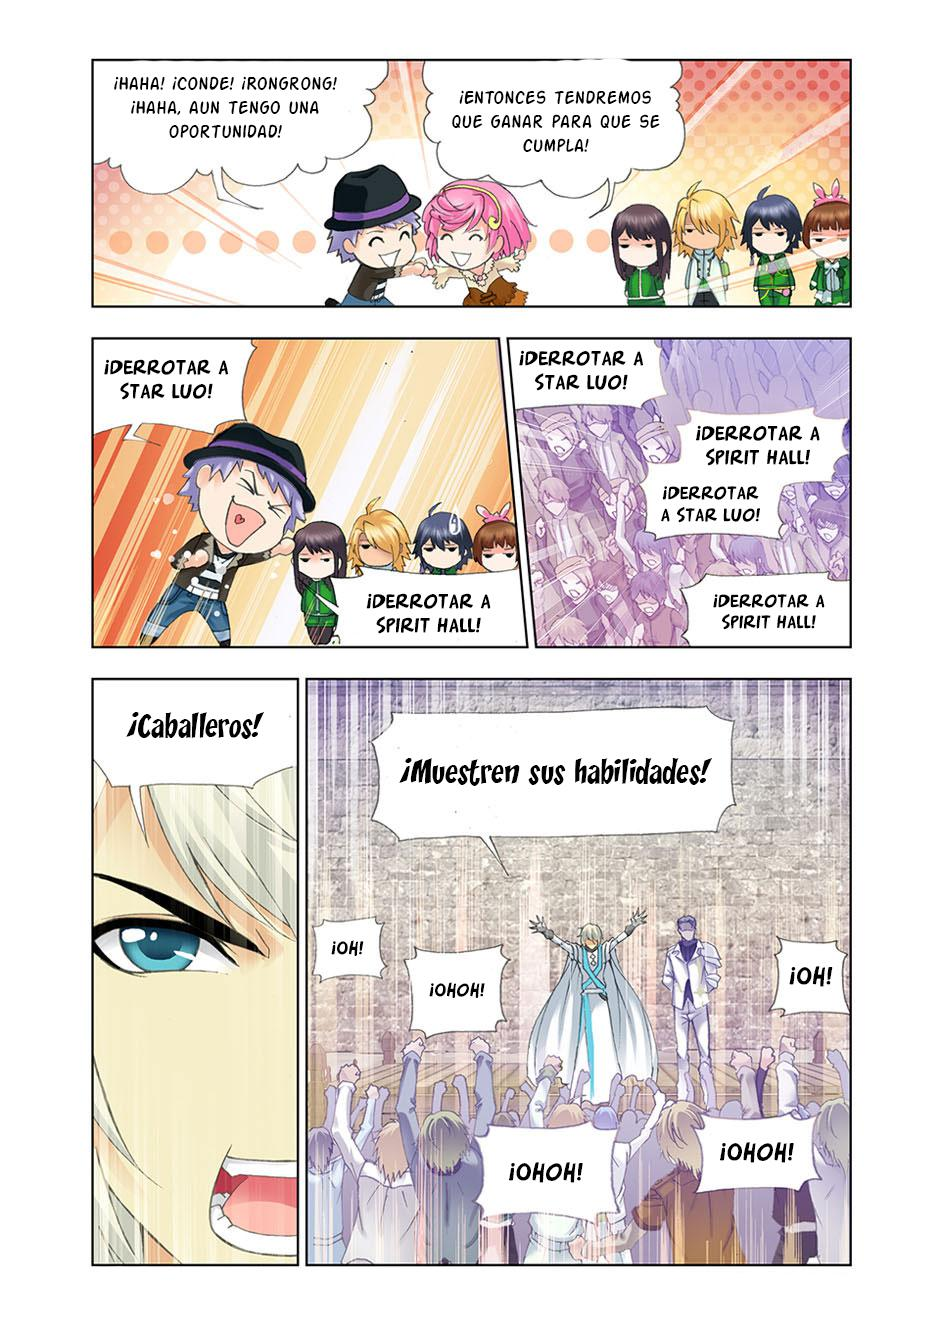 https://c5.ninemanga.com/es_manga/18/16210/417007/9d87746cec08e6734c6b91f464cba6b0.jpg Page 8